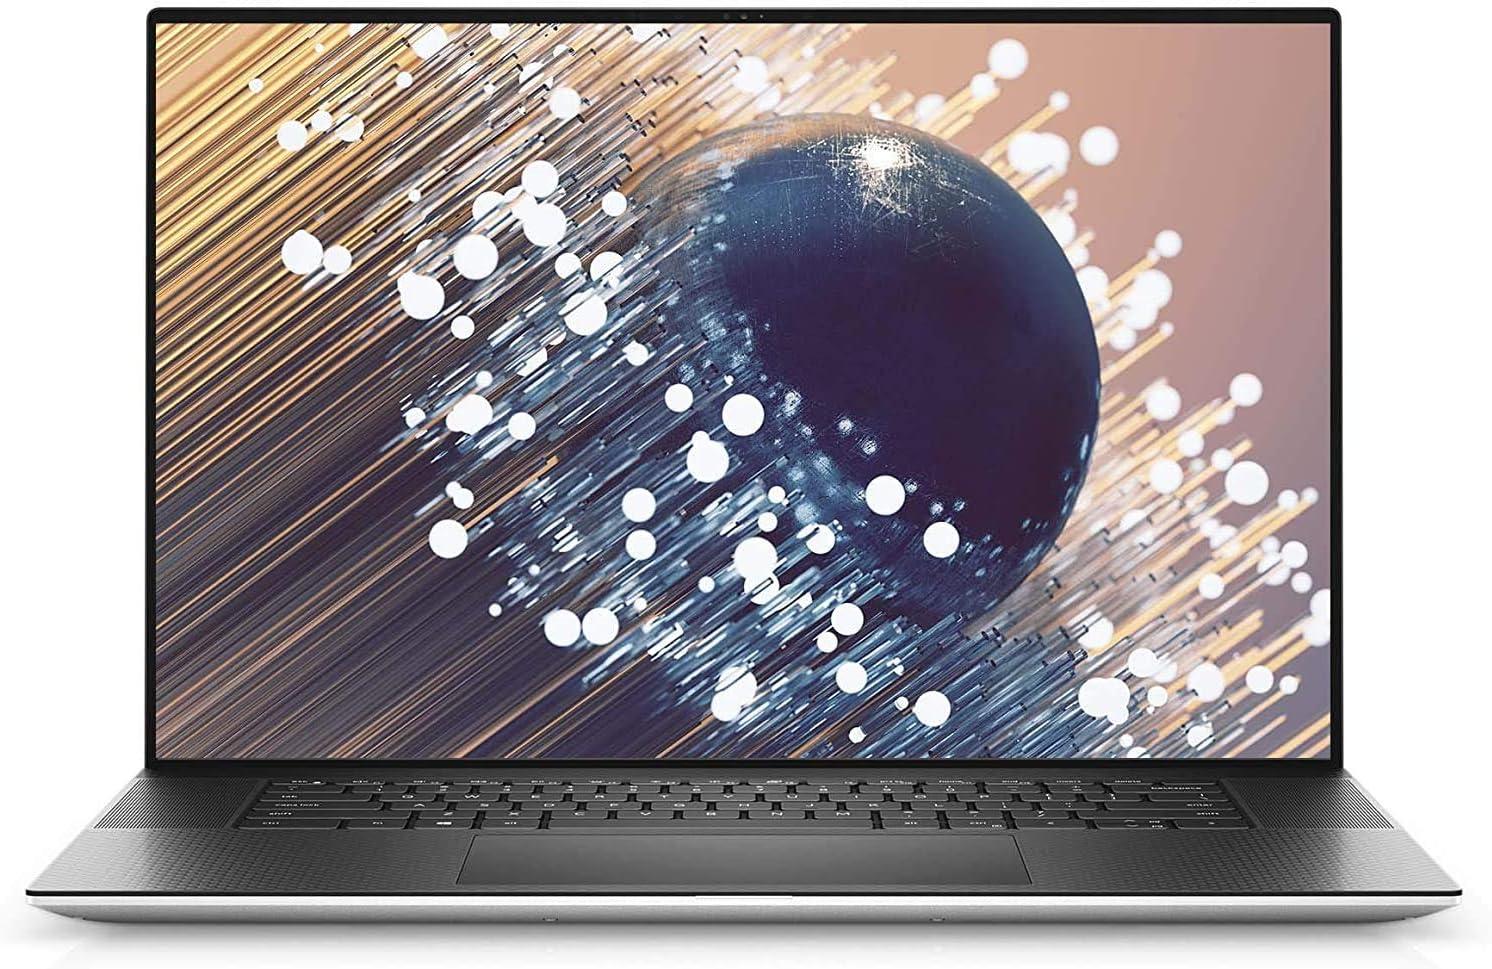 New Dell XPS 17 9700 17 inch UHD Plus Laptop (Silver) Intel i7-10750H 10th Gen, 32GB DDR4 RAM, 1TB SSD, NVIDIA GeForce RTX 1650 Ti 4GB GDDR6, Windows 10 Home (Renewed)